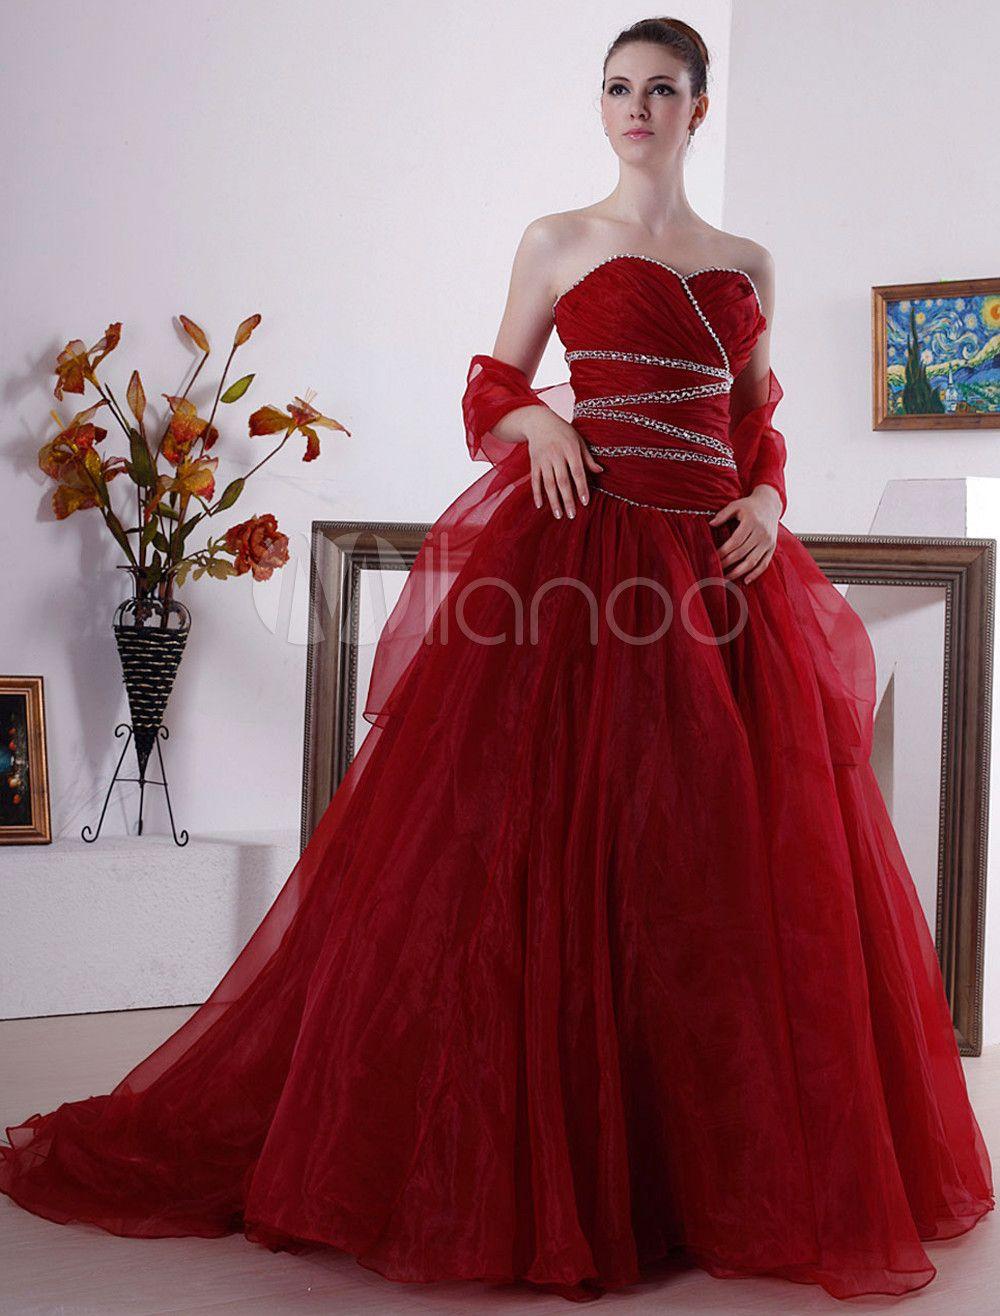 rouge et or robe de mari e robes de mariee rouge. Black Bedroom Furniture Sets. Home Design Ideas